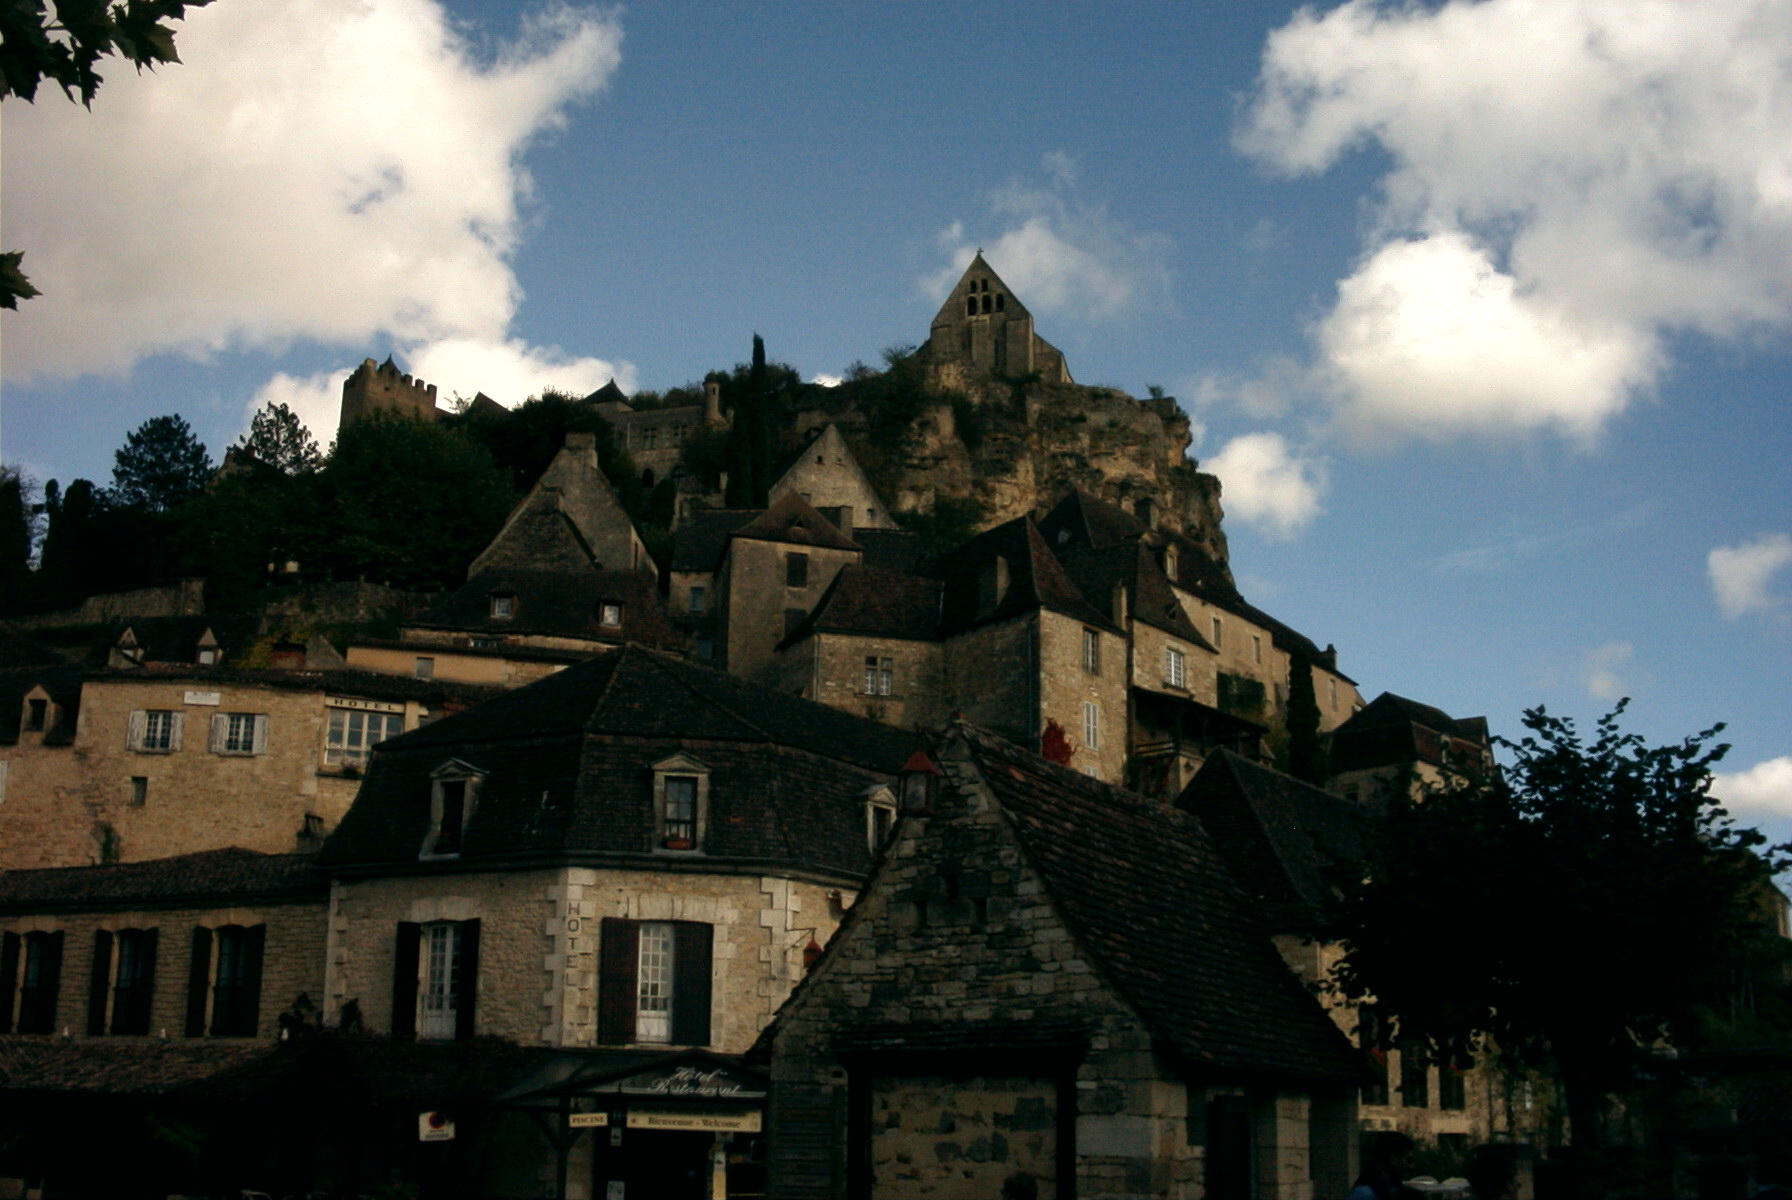 French Landscape 3 by djgruny